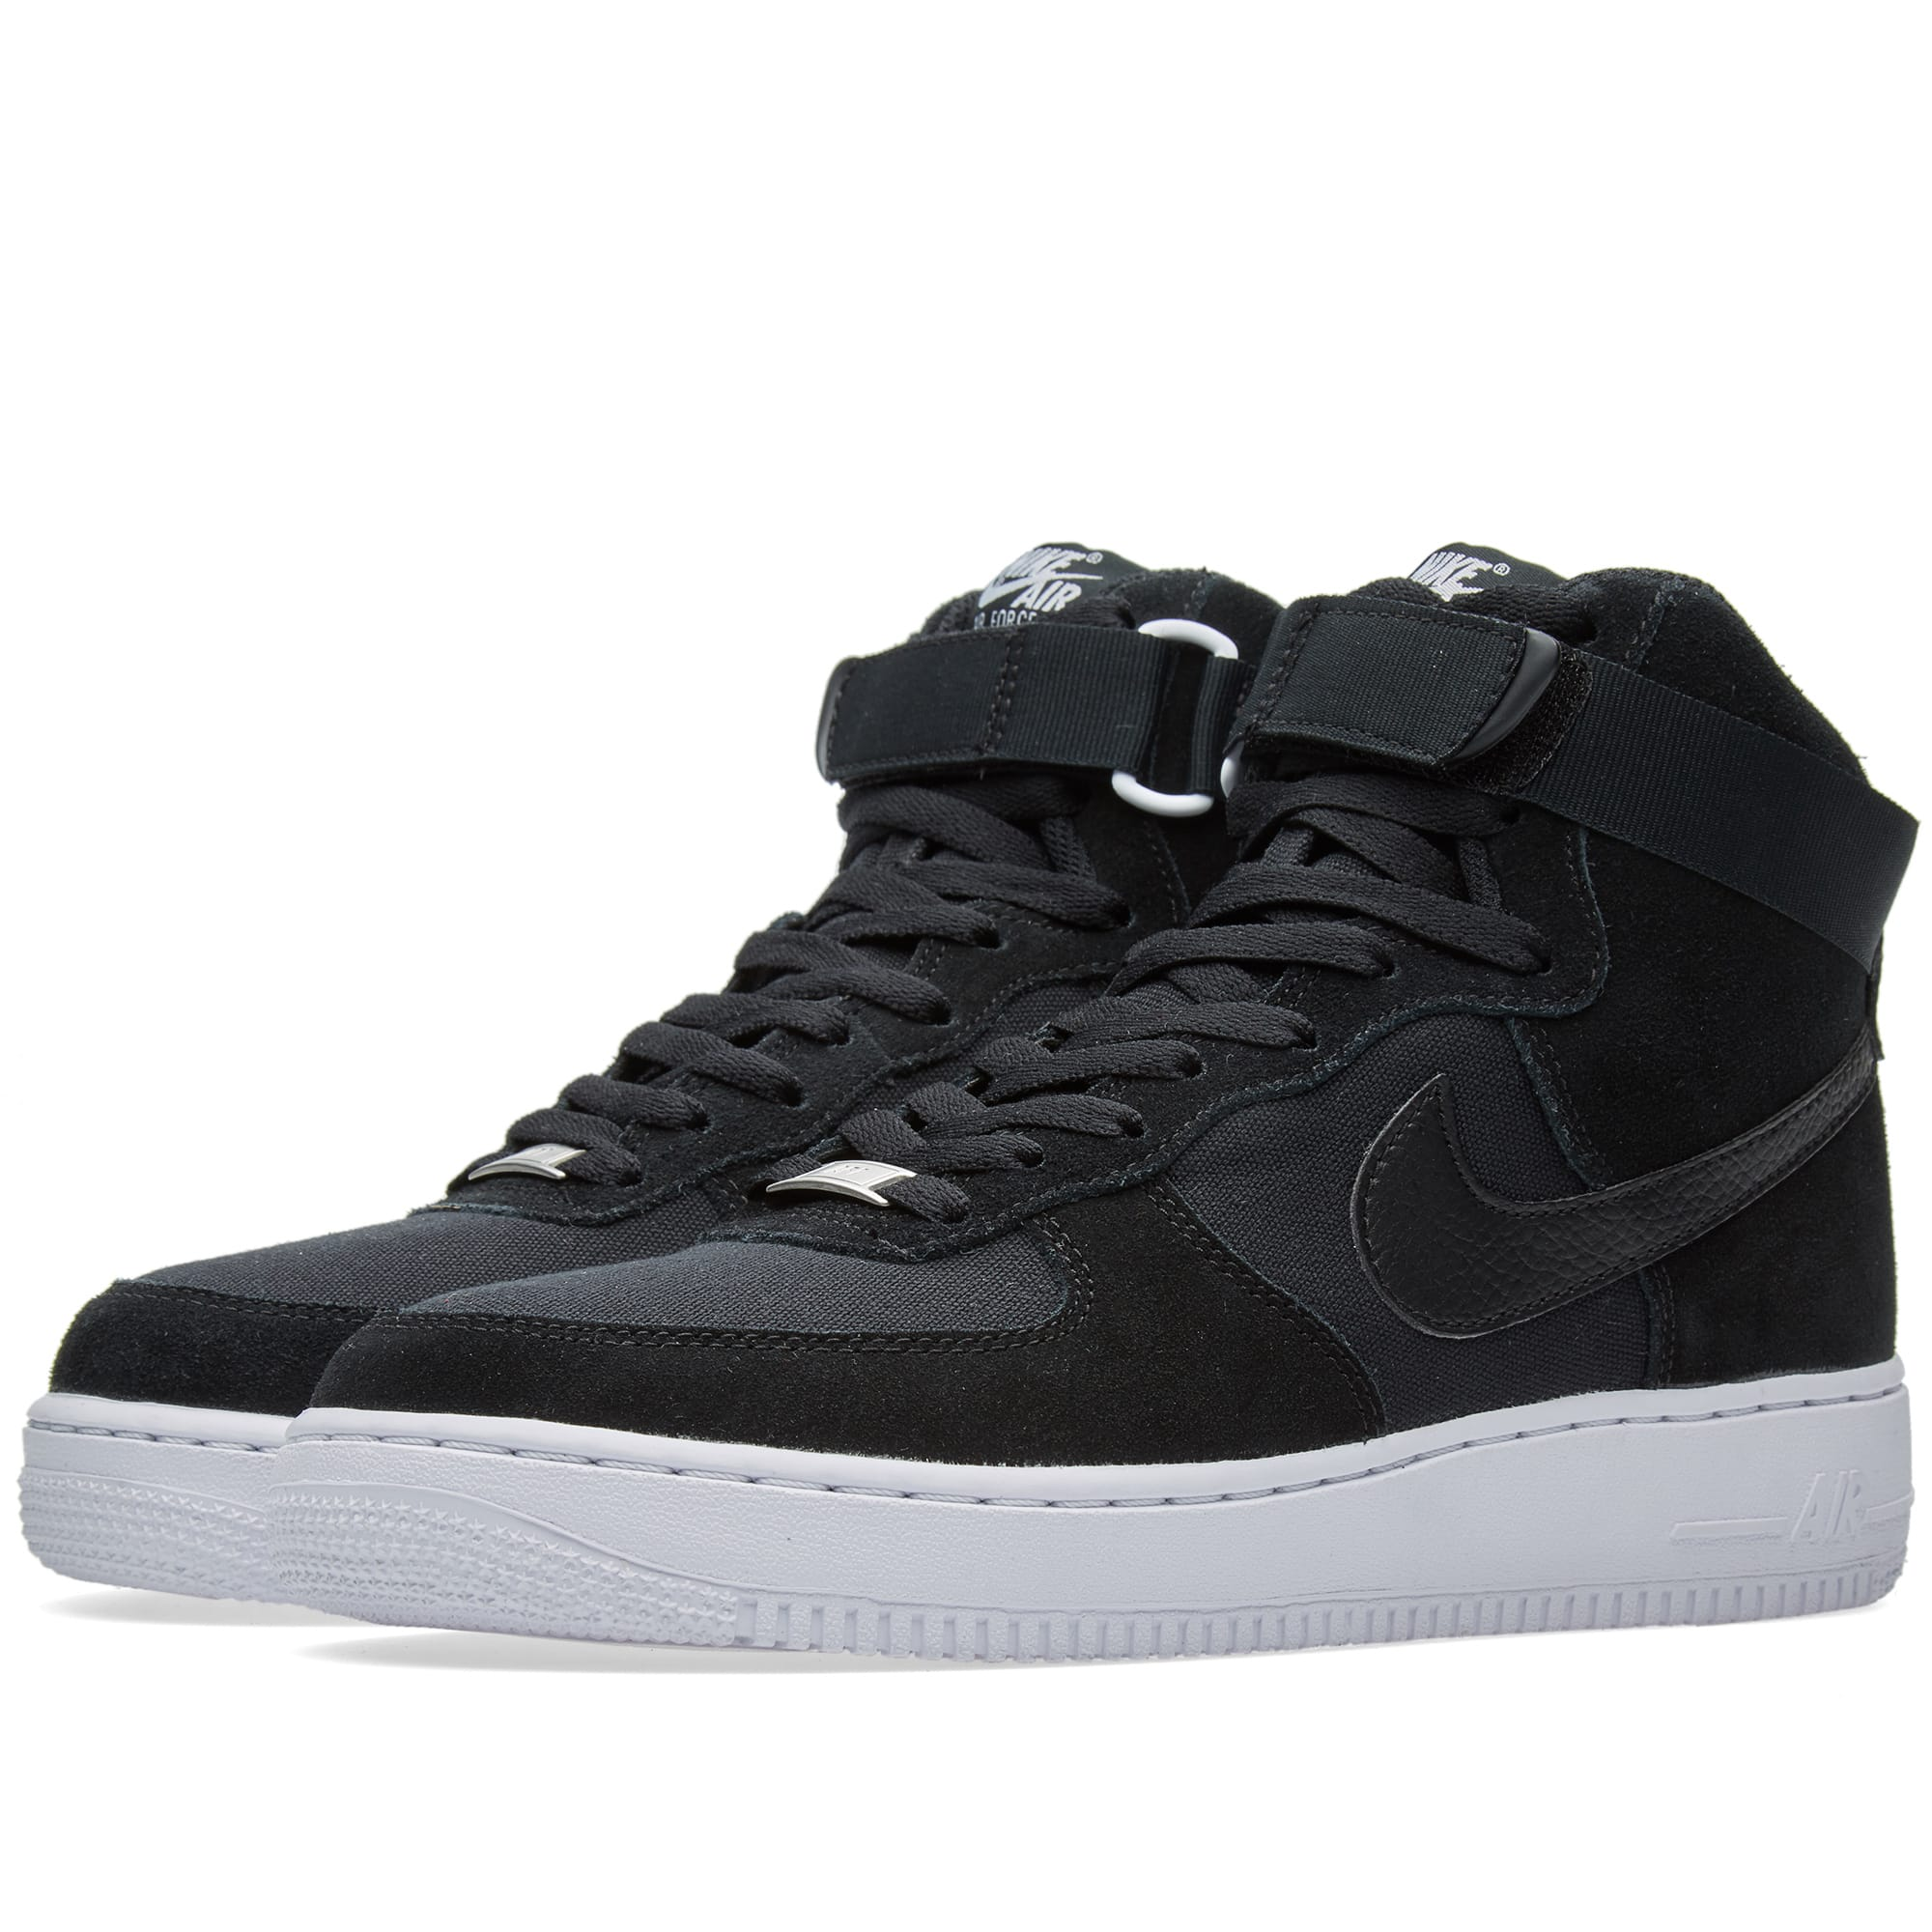 Nike Air Force 1 High 07 Black/White